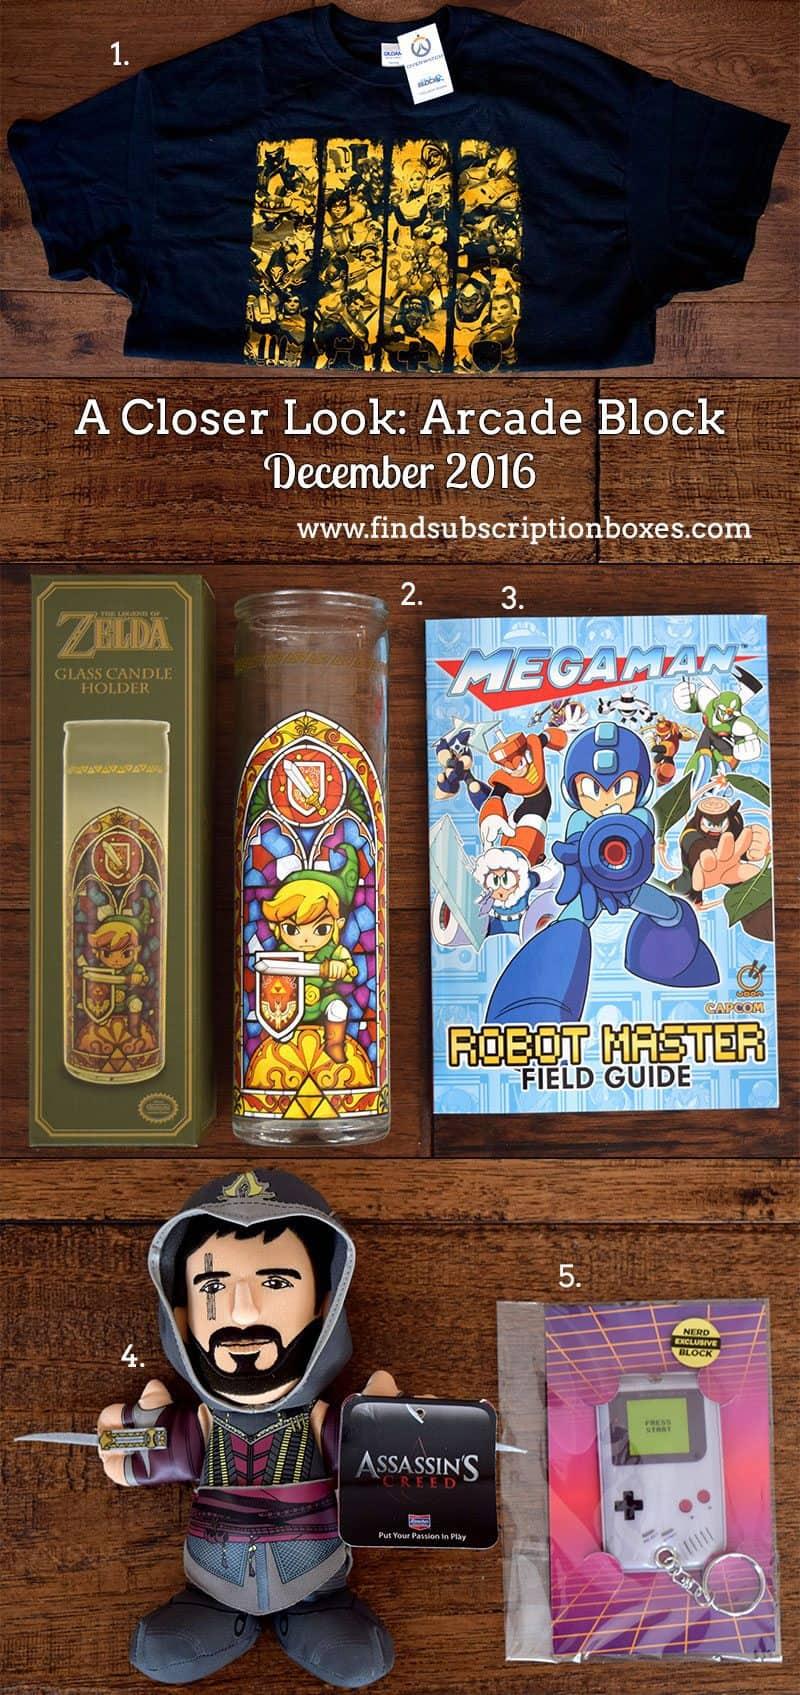 December 2016 Arcade Block Review - Inside the Box